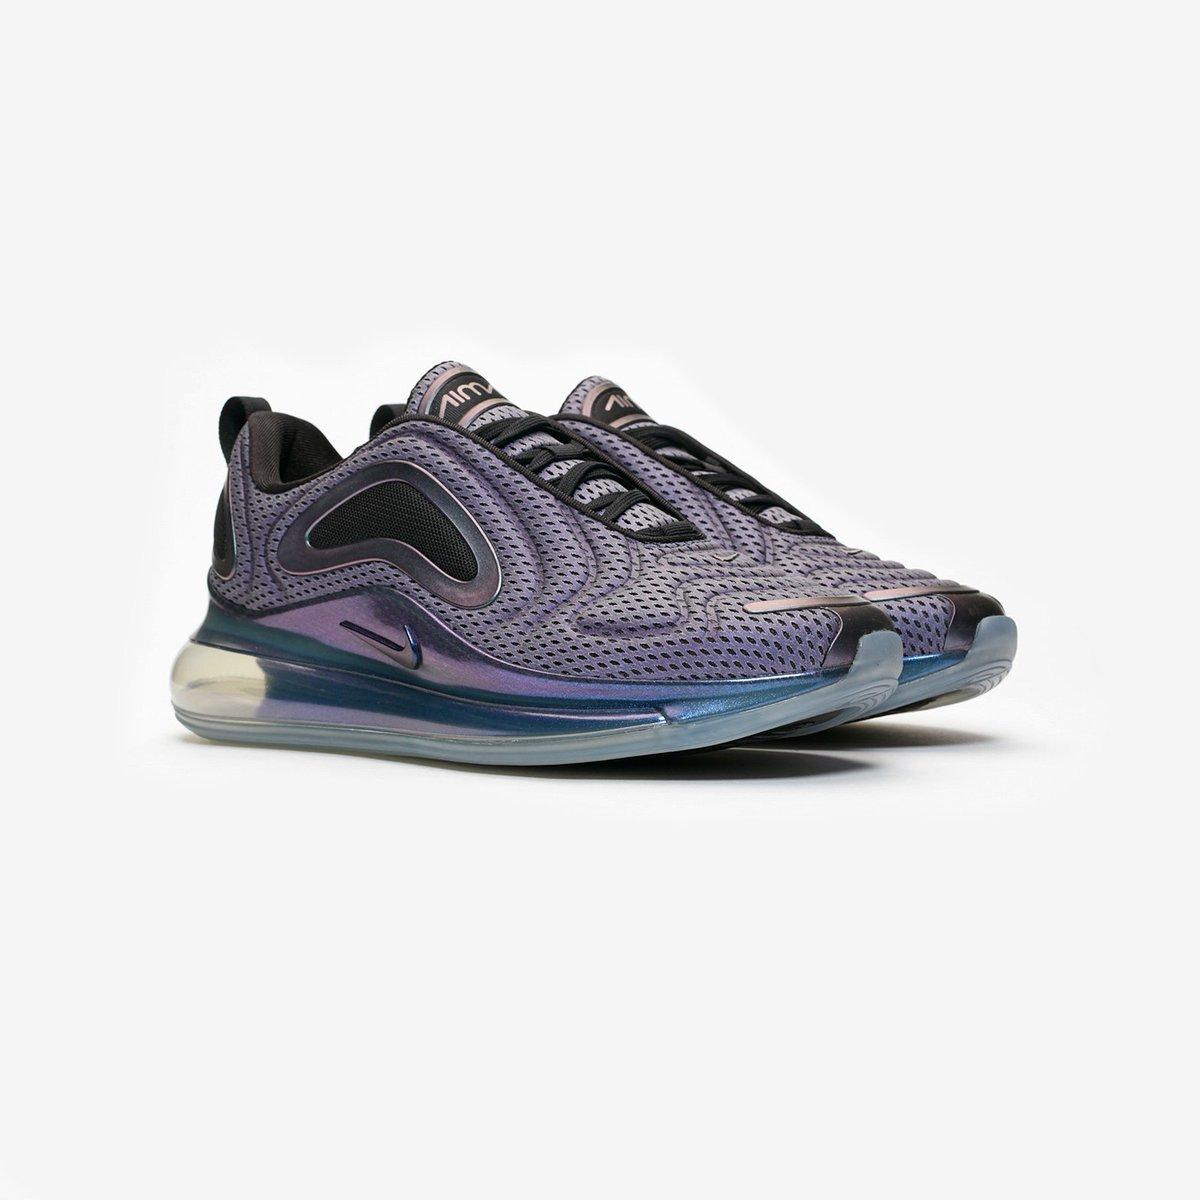 e5b4aa31d51d Sneakersnstuff on Twitter